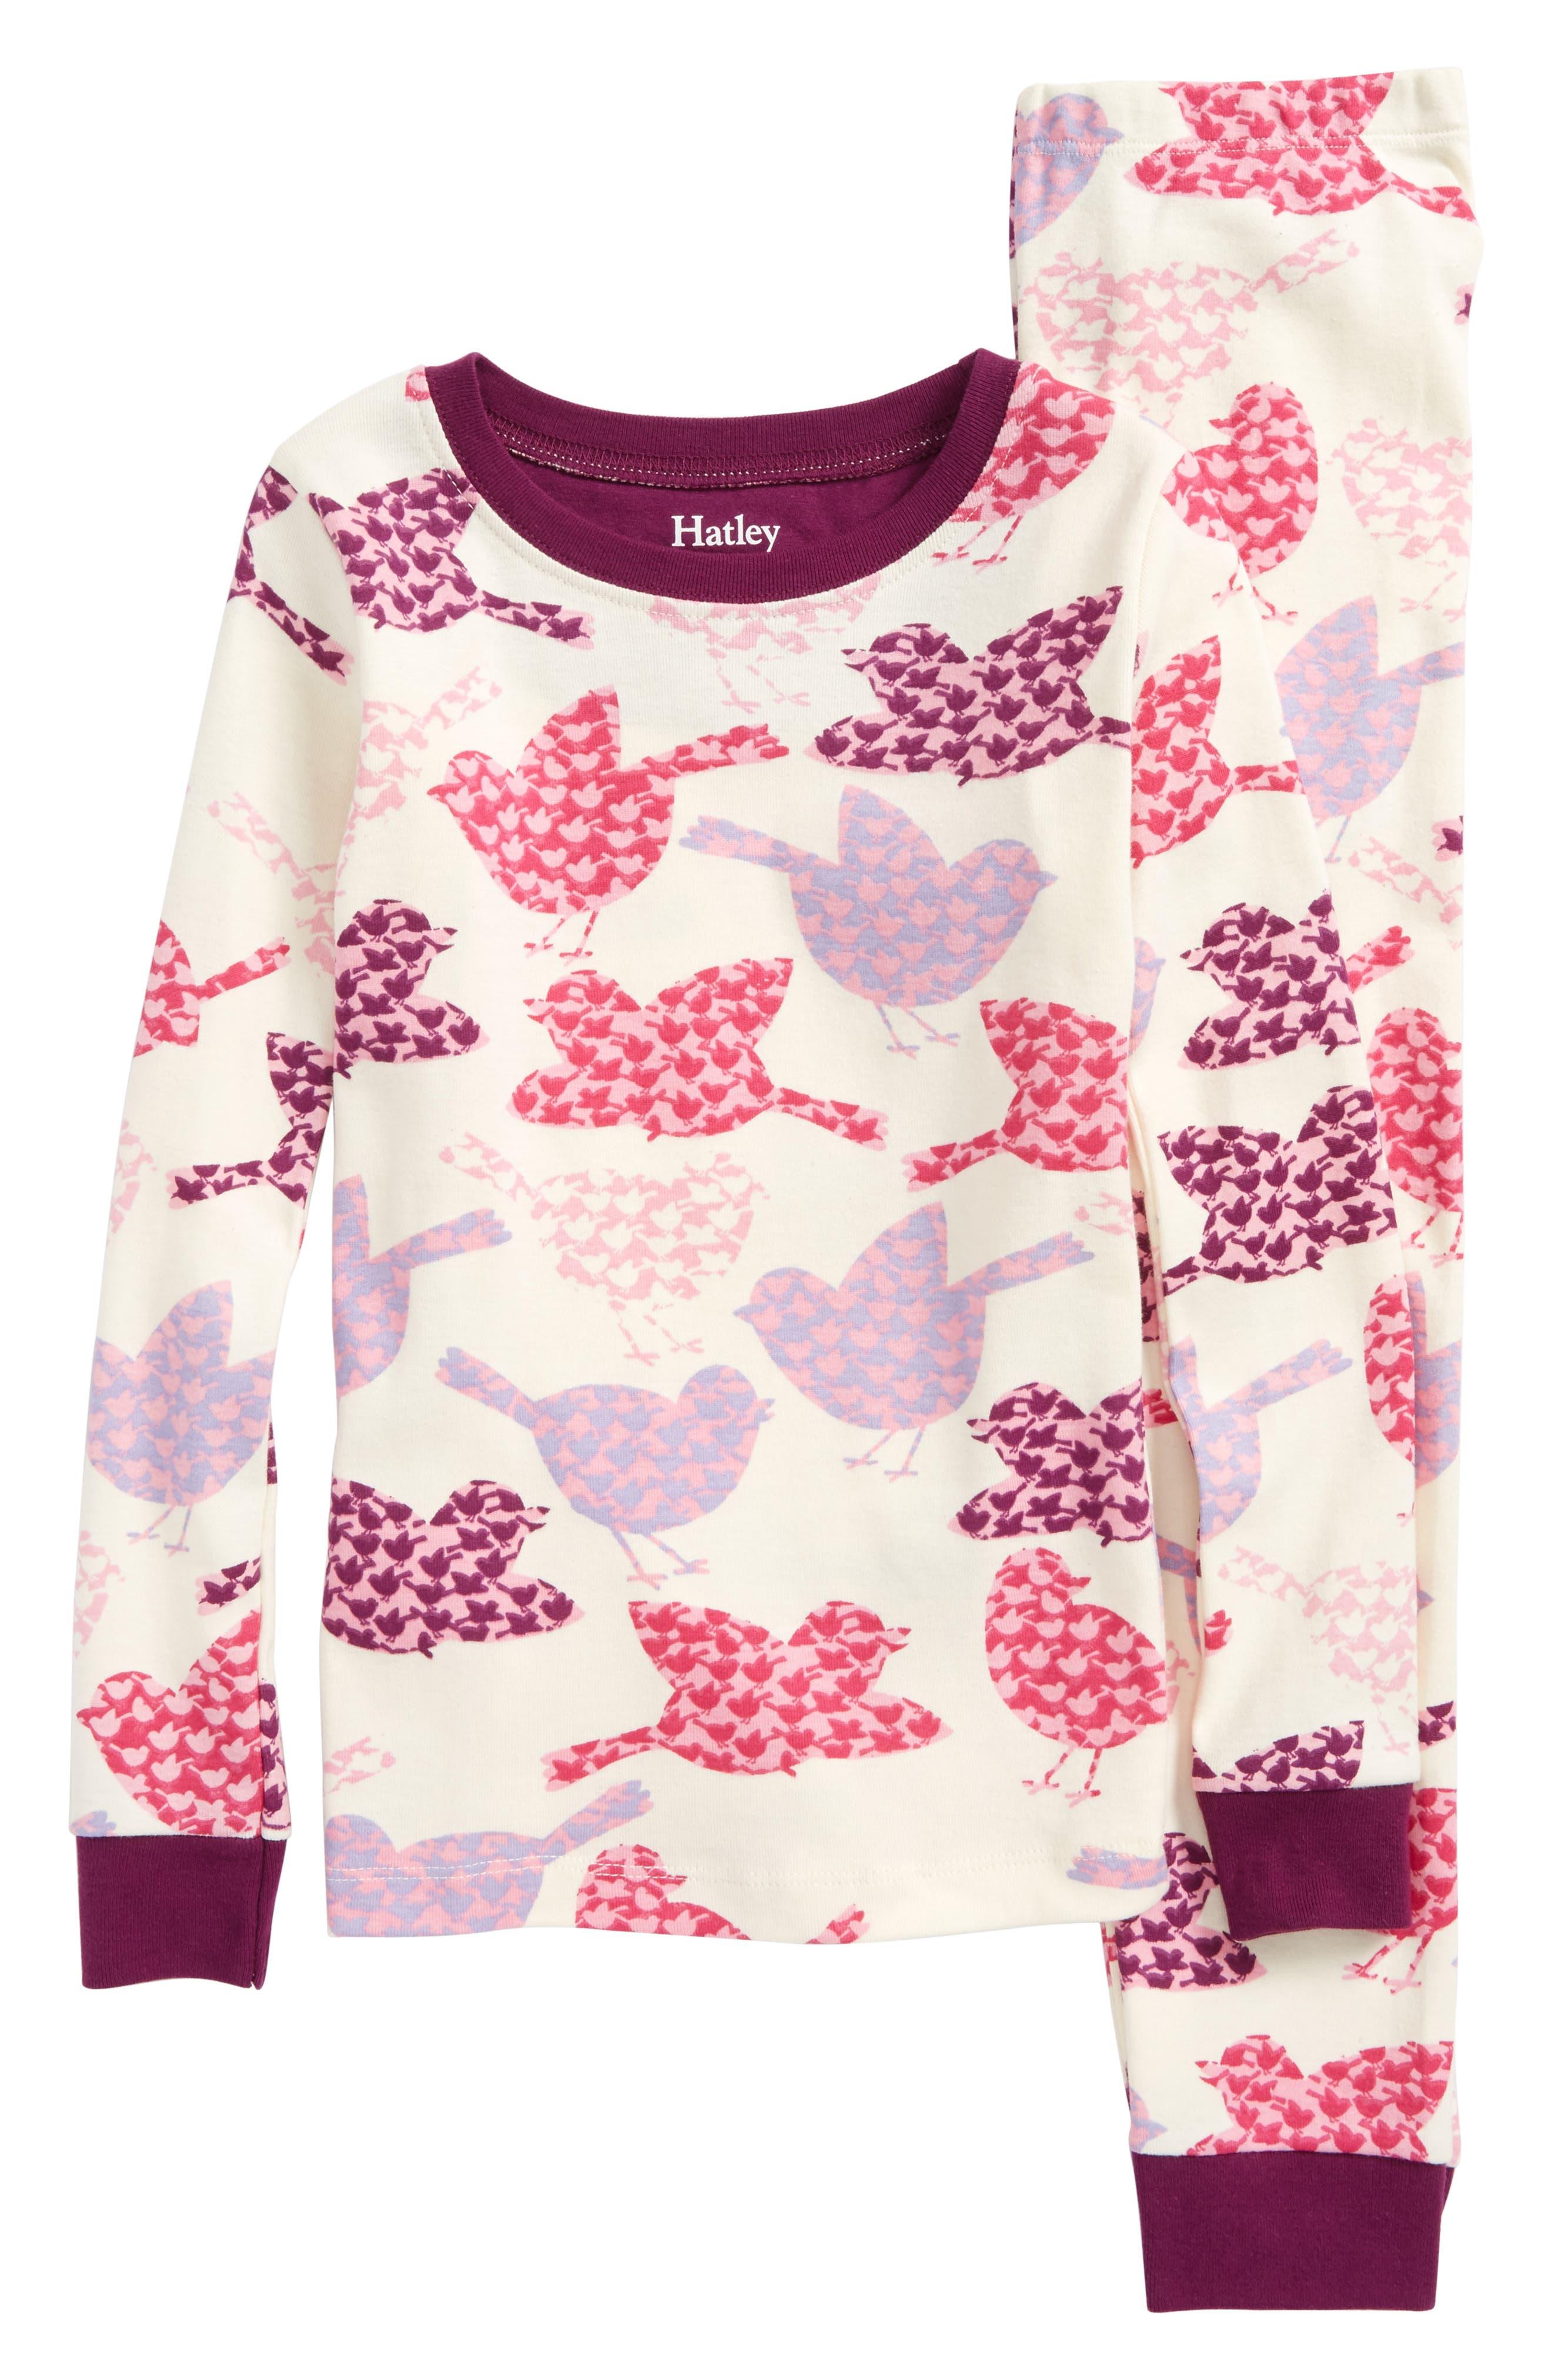 Main Image - Hatley Bird Print Organic Cotton Fitted Two-Piece Pajamas (Toddler Girls, Little Girls & Big Girls)